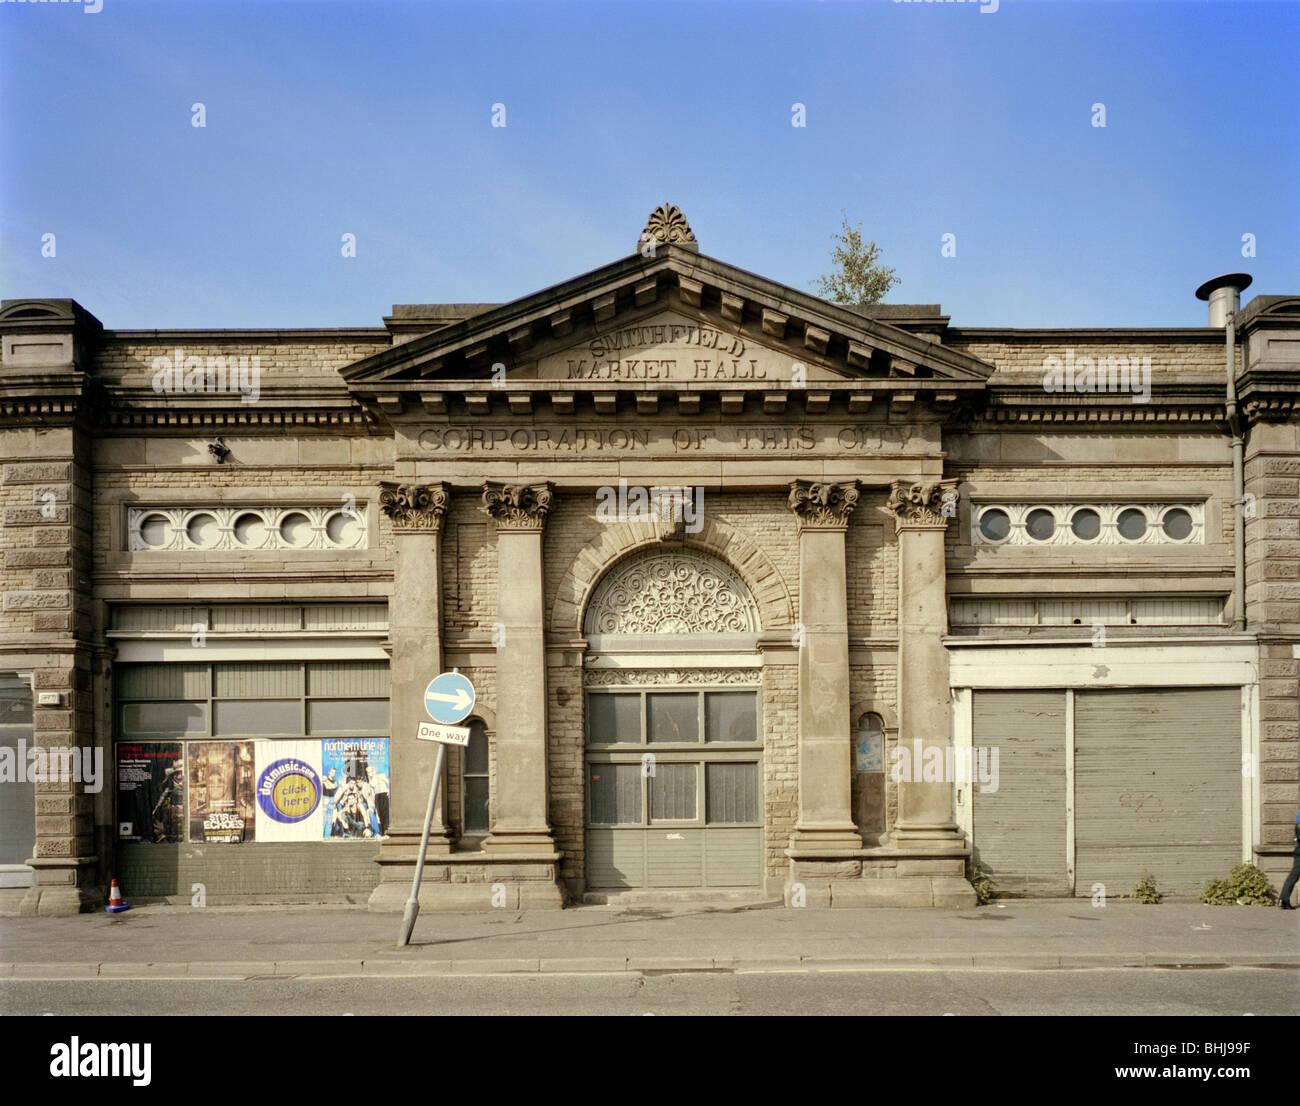 Smithfield Market 39-57 Swan Street Manchester 2000. Artist JO & Swan Street Stock Photos u0026 Swan Street Stock Images - Alamy